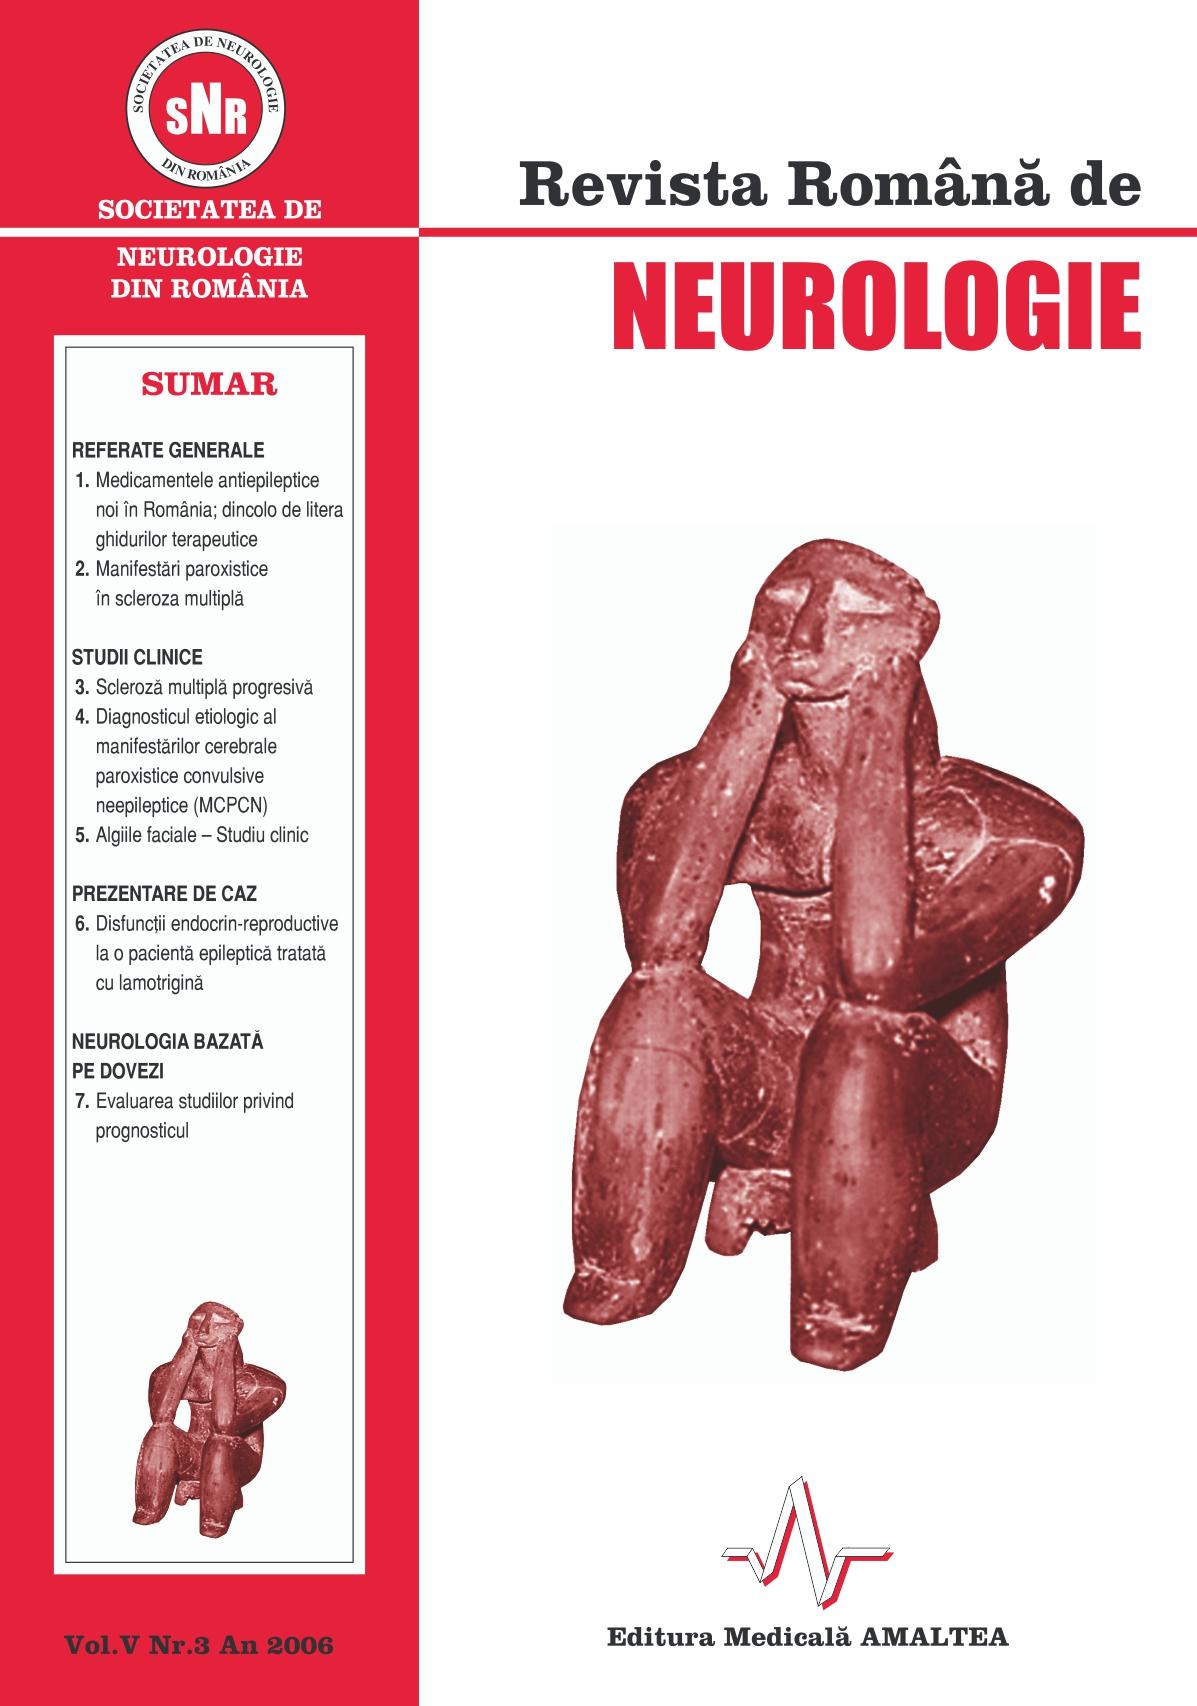 Romanian Journal of Neurology, Volume V, No. 3, 2006